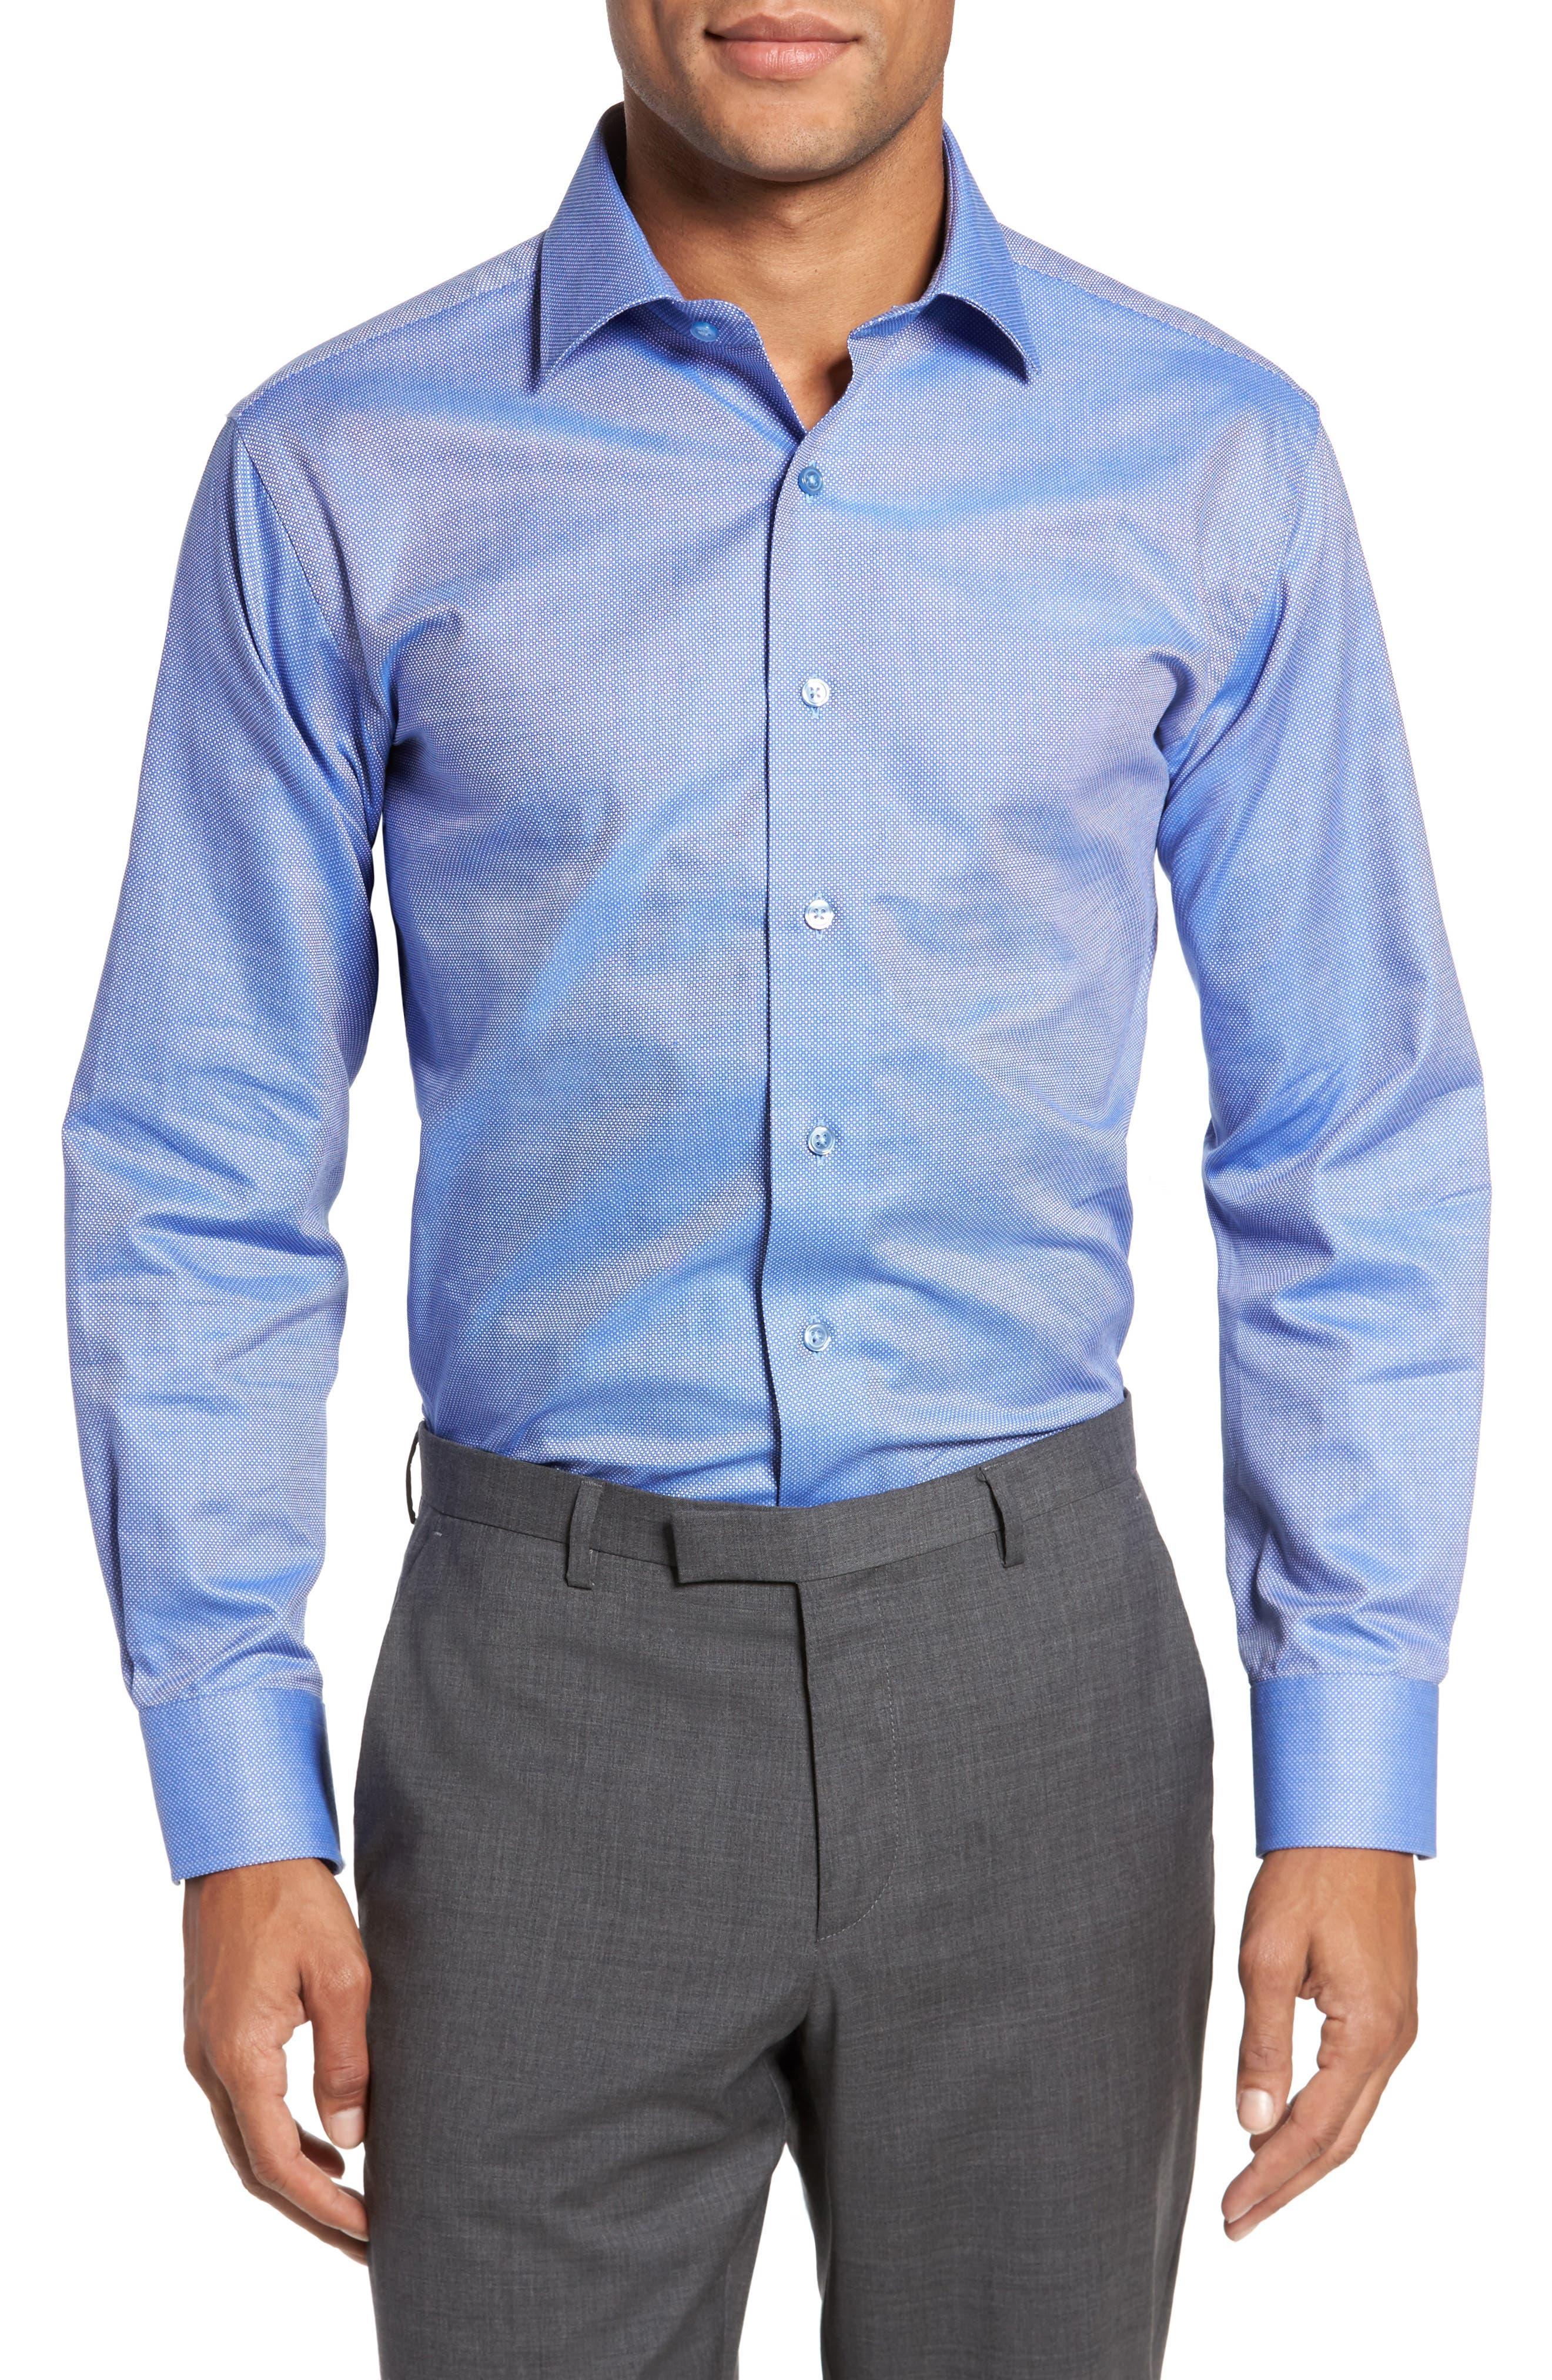 LORENZO UOMO, Trim Fit Textured Dress Shirt, Main thumbnail 1, color, NAVY